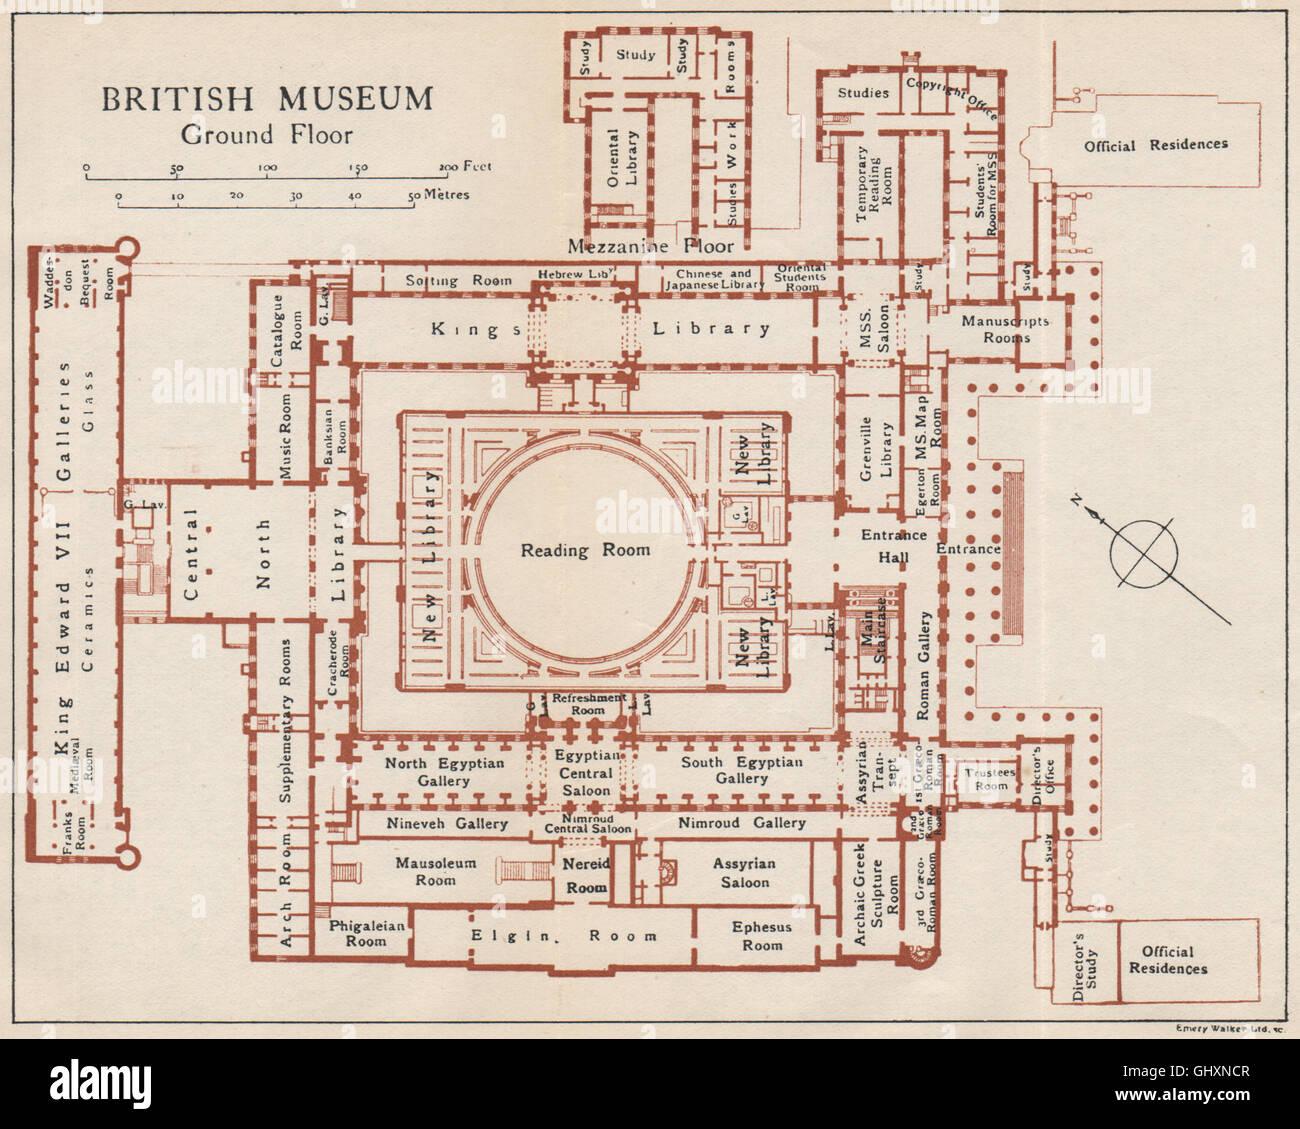 British Museum Ground Floor Vintage Map Plan London 1935 Stock